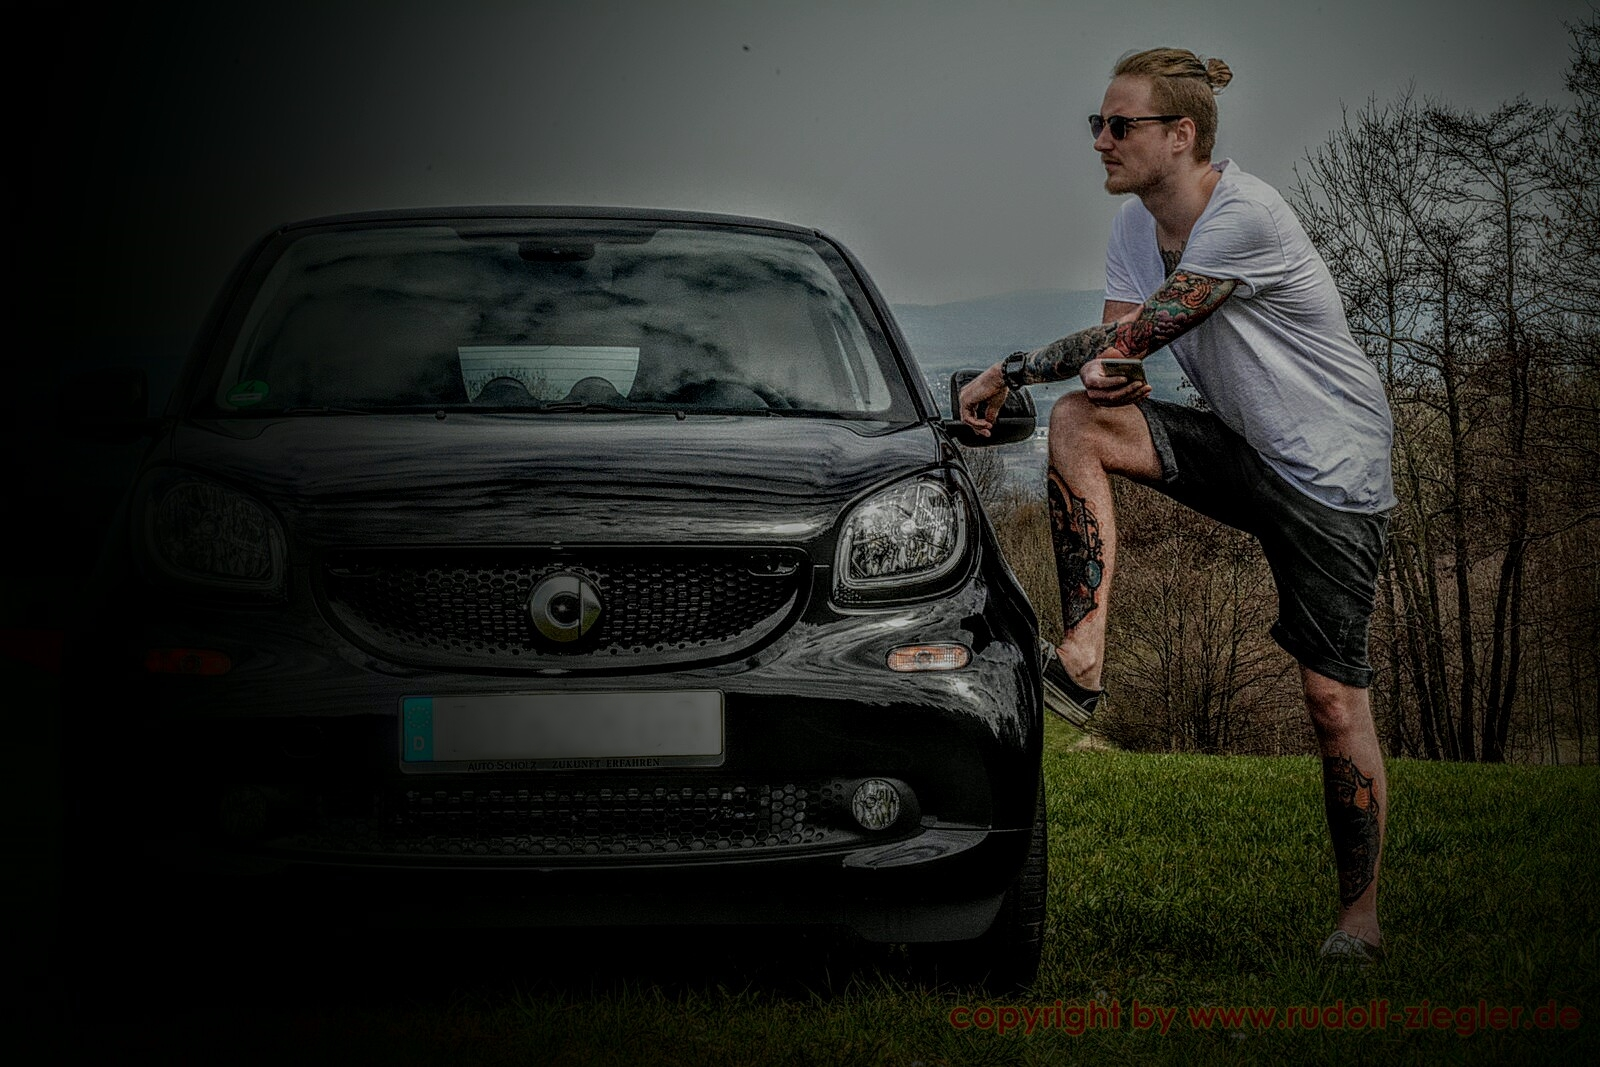 Fotoshooting SMART meets MARTIN 010-Bearbeitet (1600x1200)-Bearbeitet